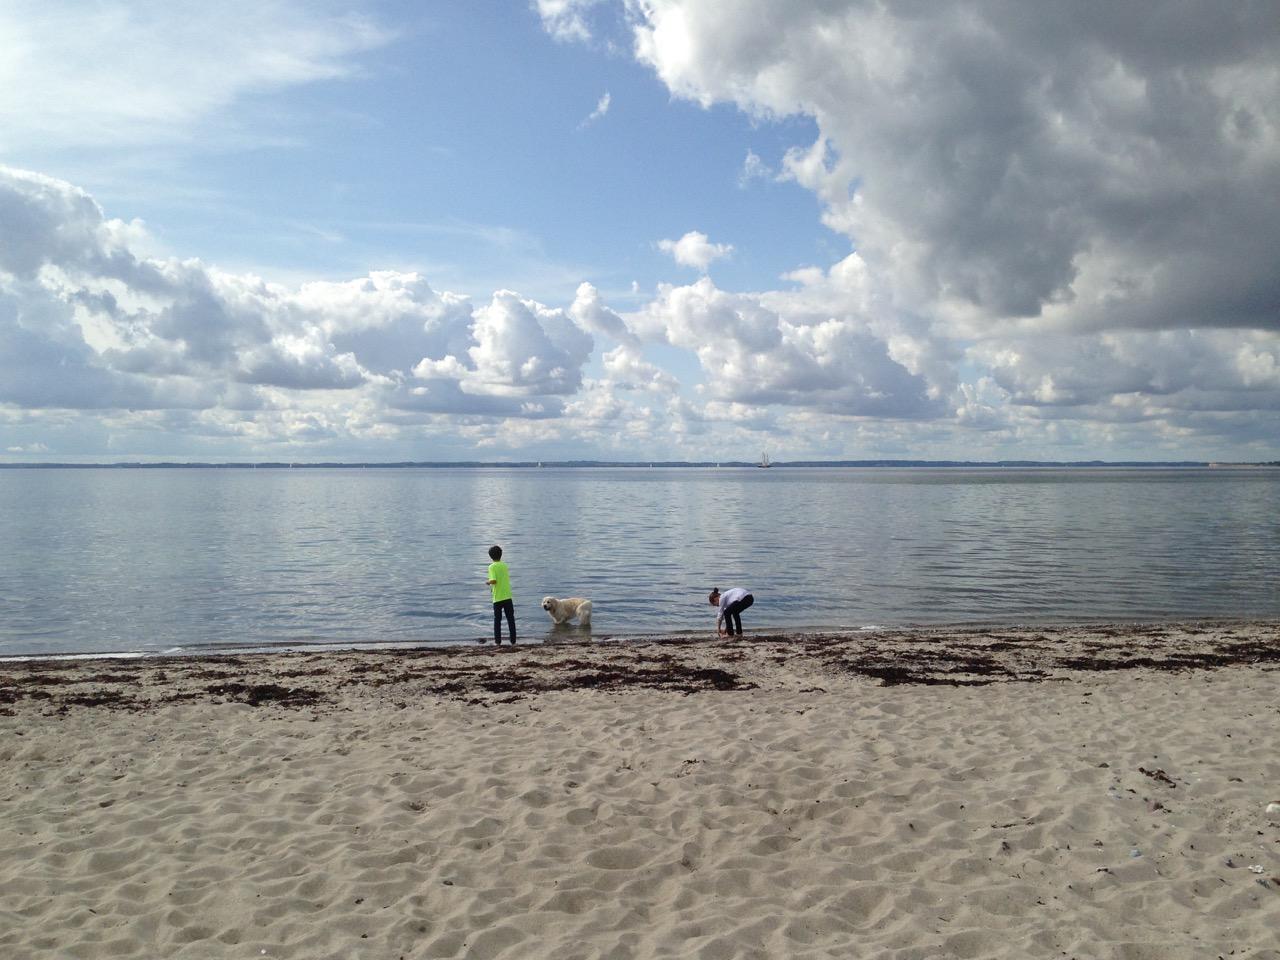 Dänemark: Die stille Ostsee um Kegnaes / Visual Vest